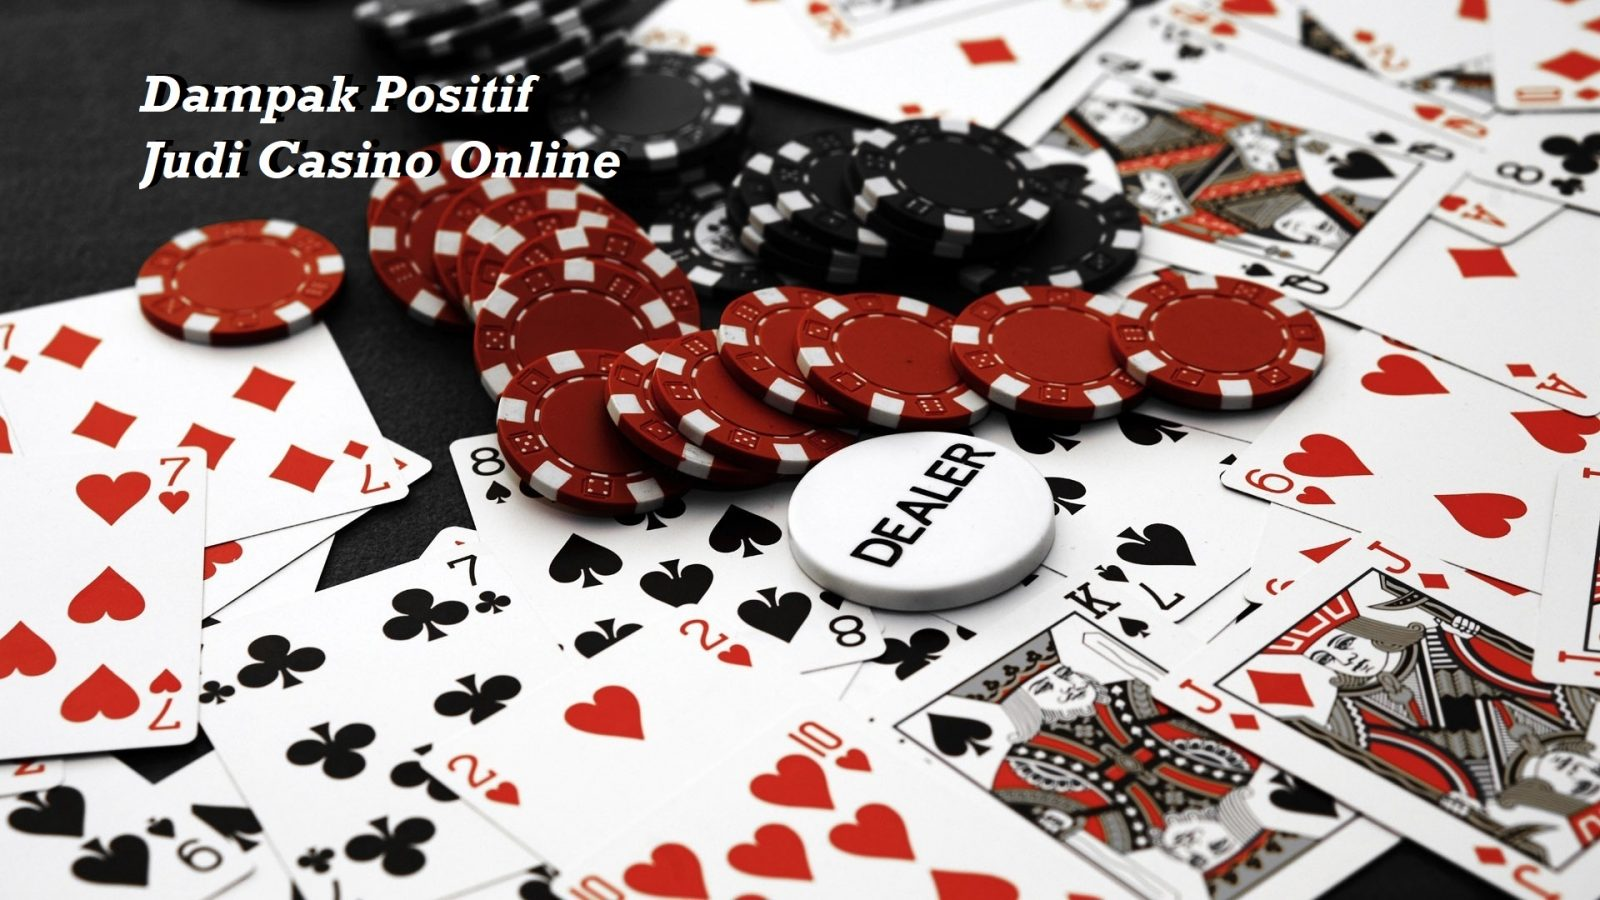 Dampak Positif Judi Casino Online